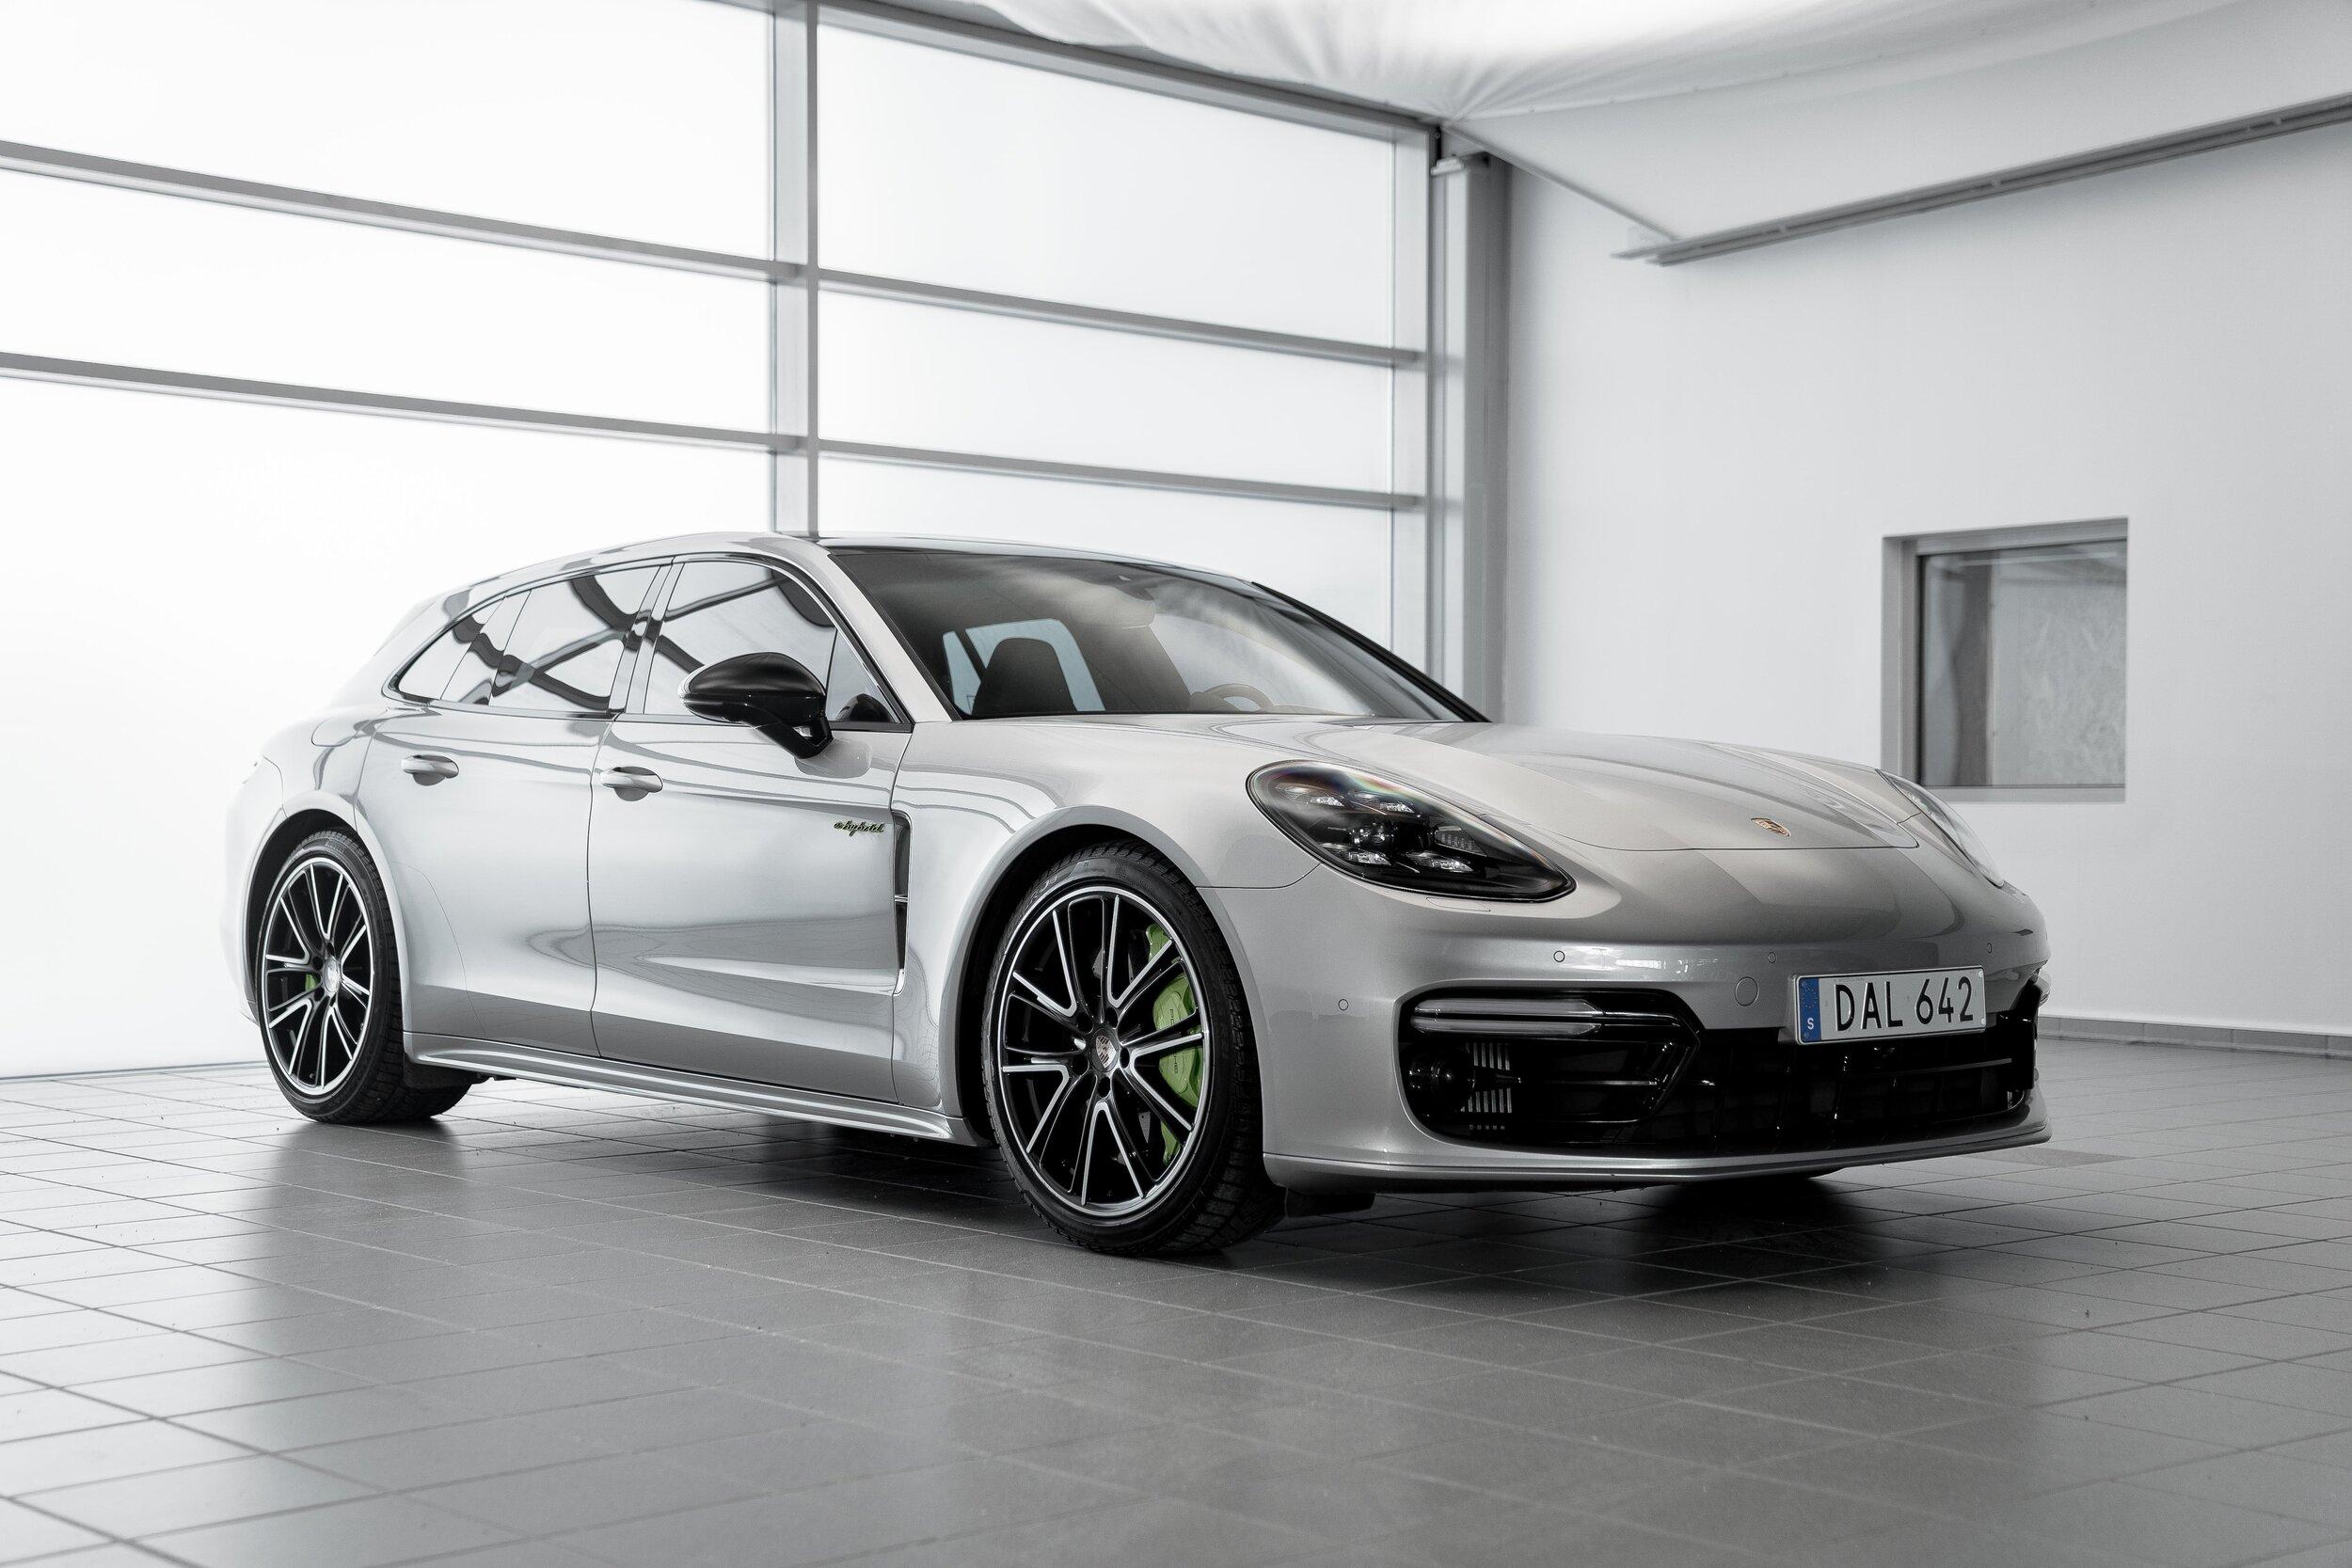 Porsche Panamera Turbo S E Hybrid 2018 Elferspot Com Marktplatz Fur Porsche Sportwagen